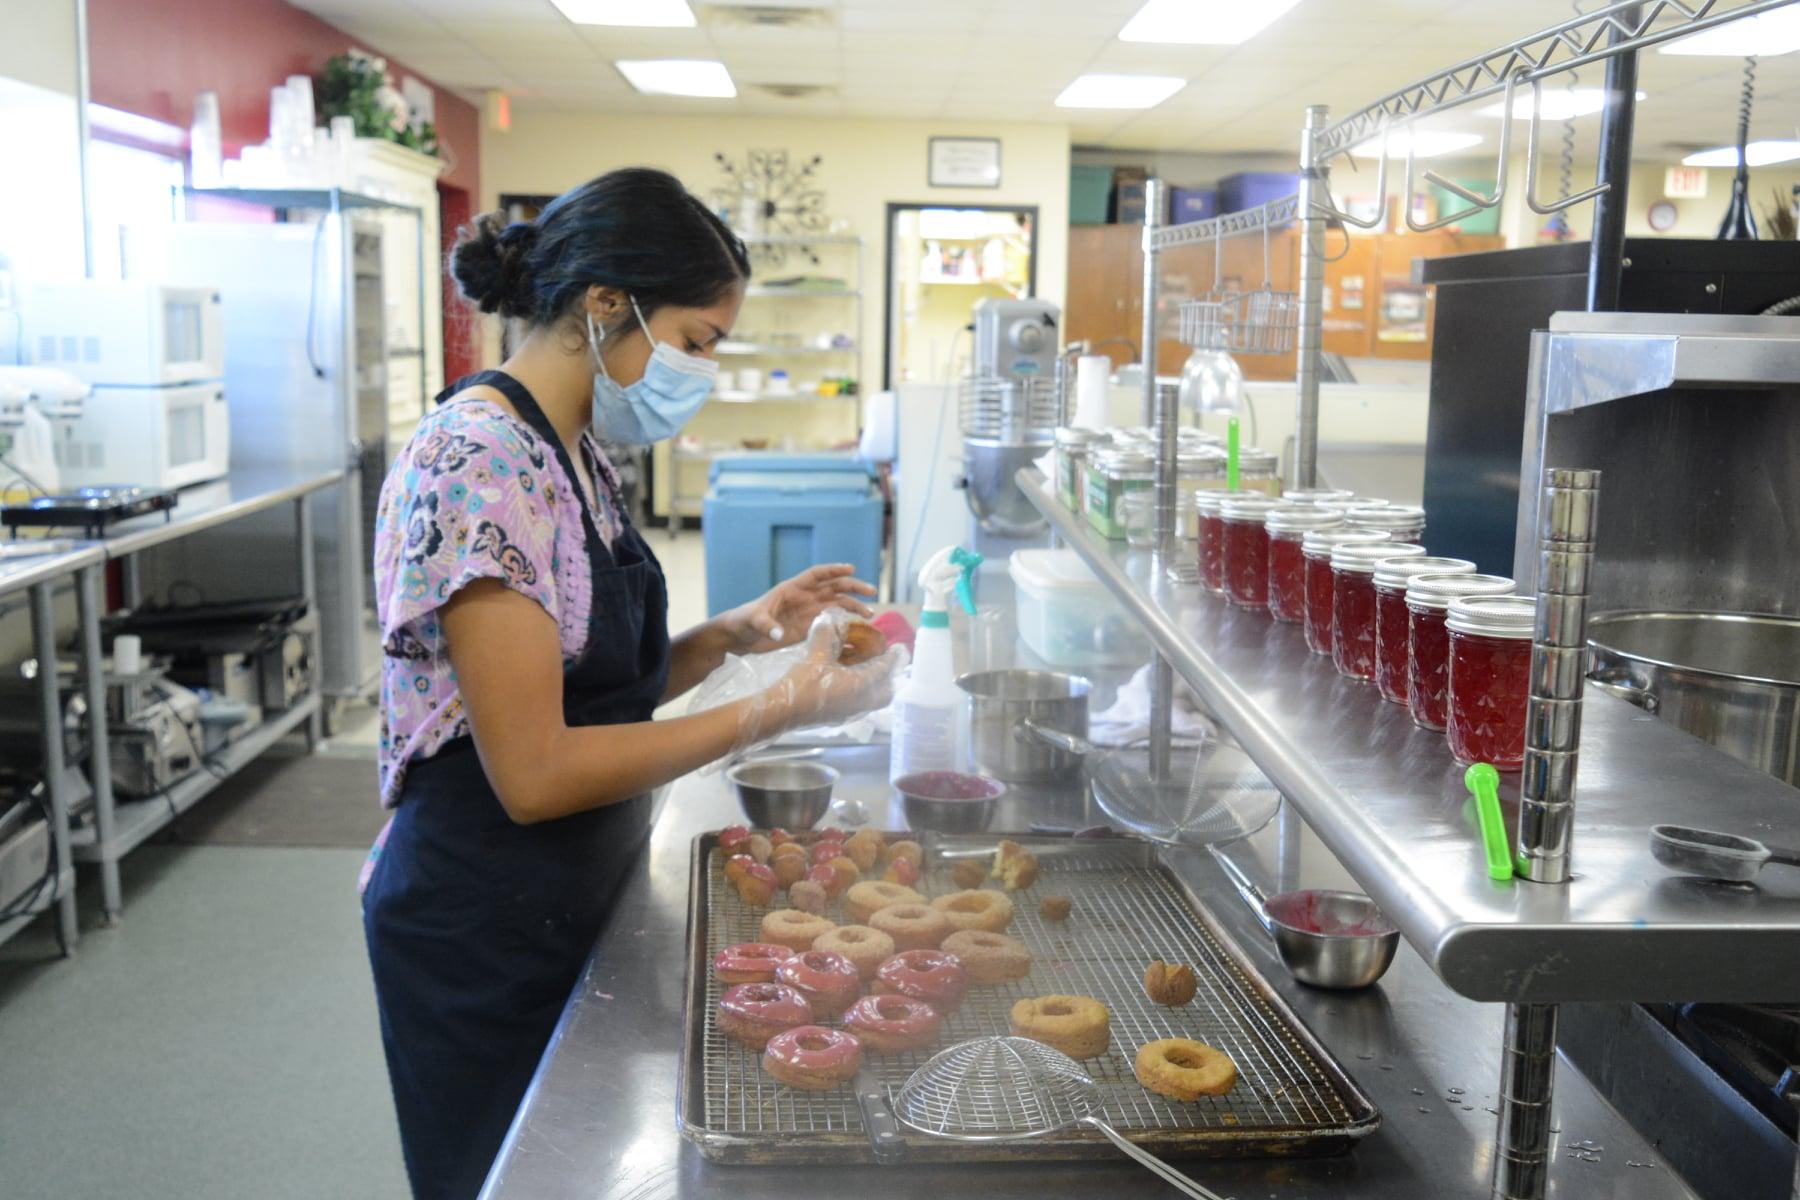 Culinary Arts student baking